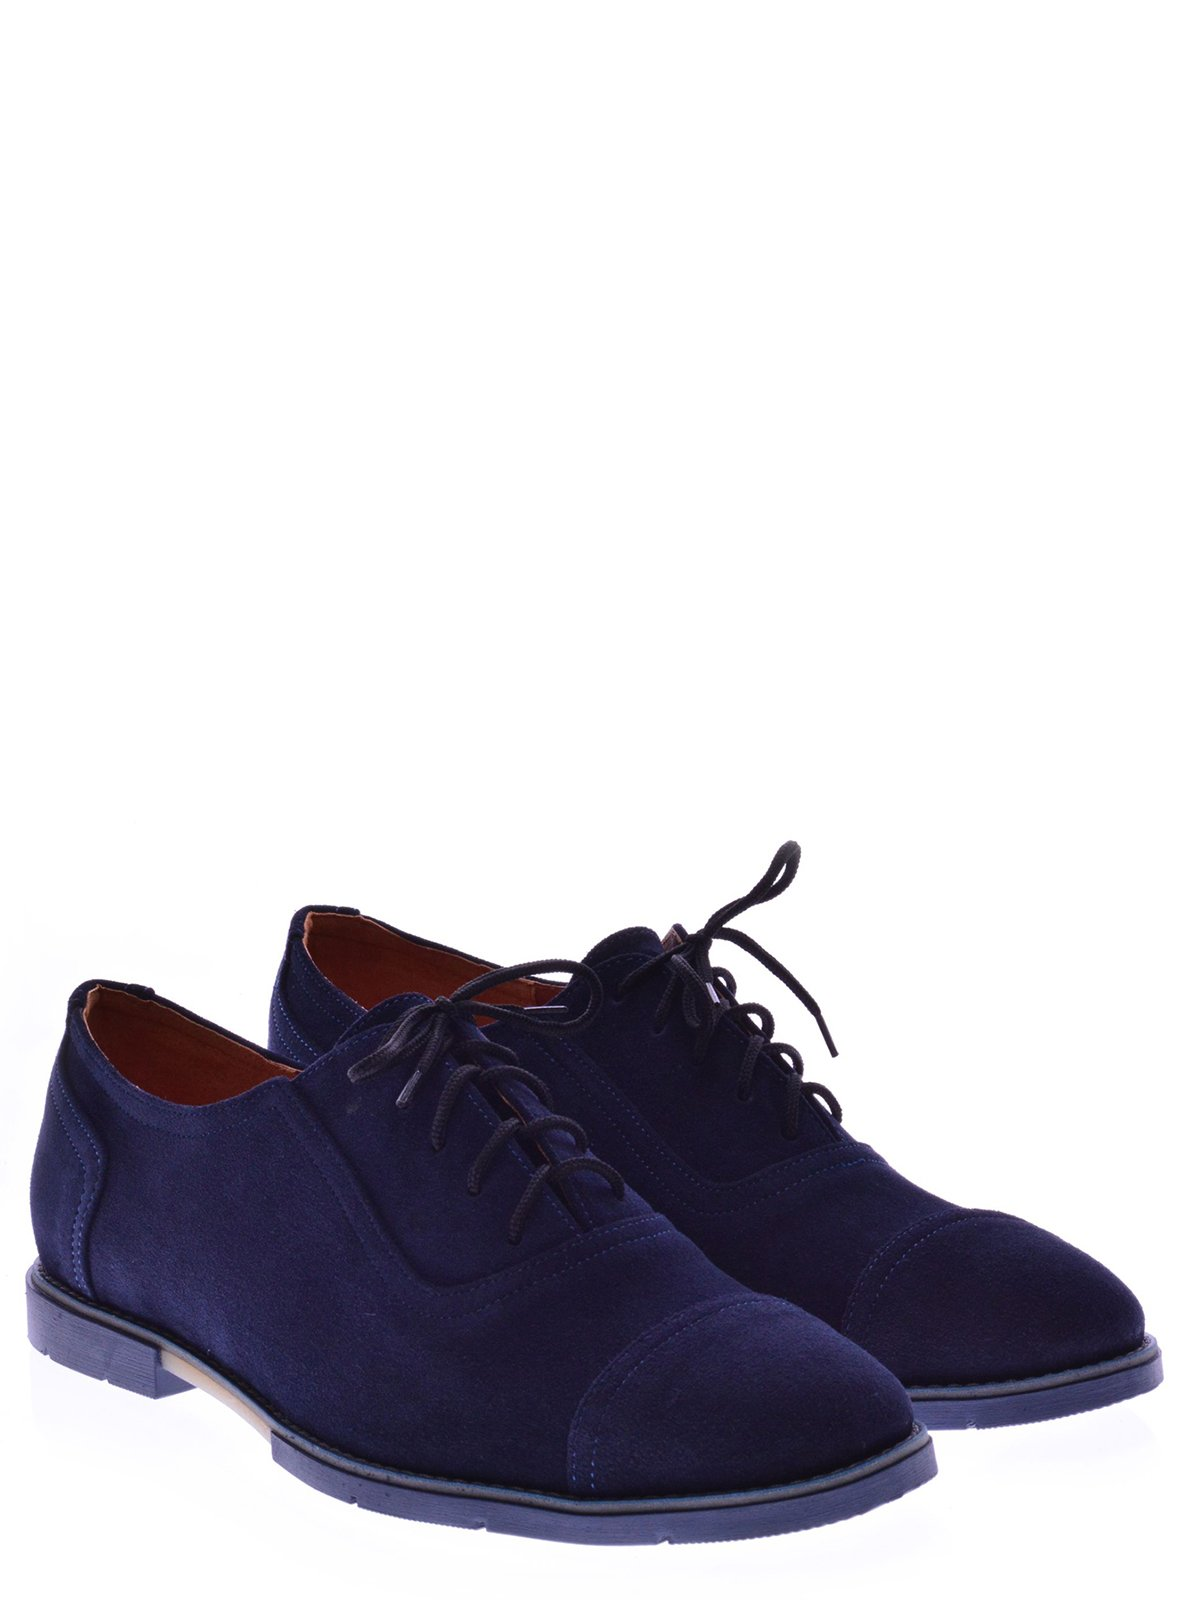 Туфли синие   2705840